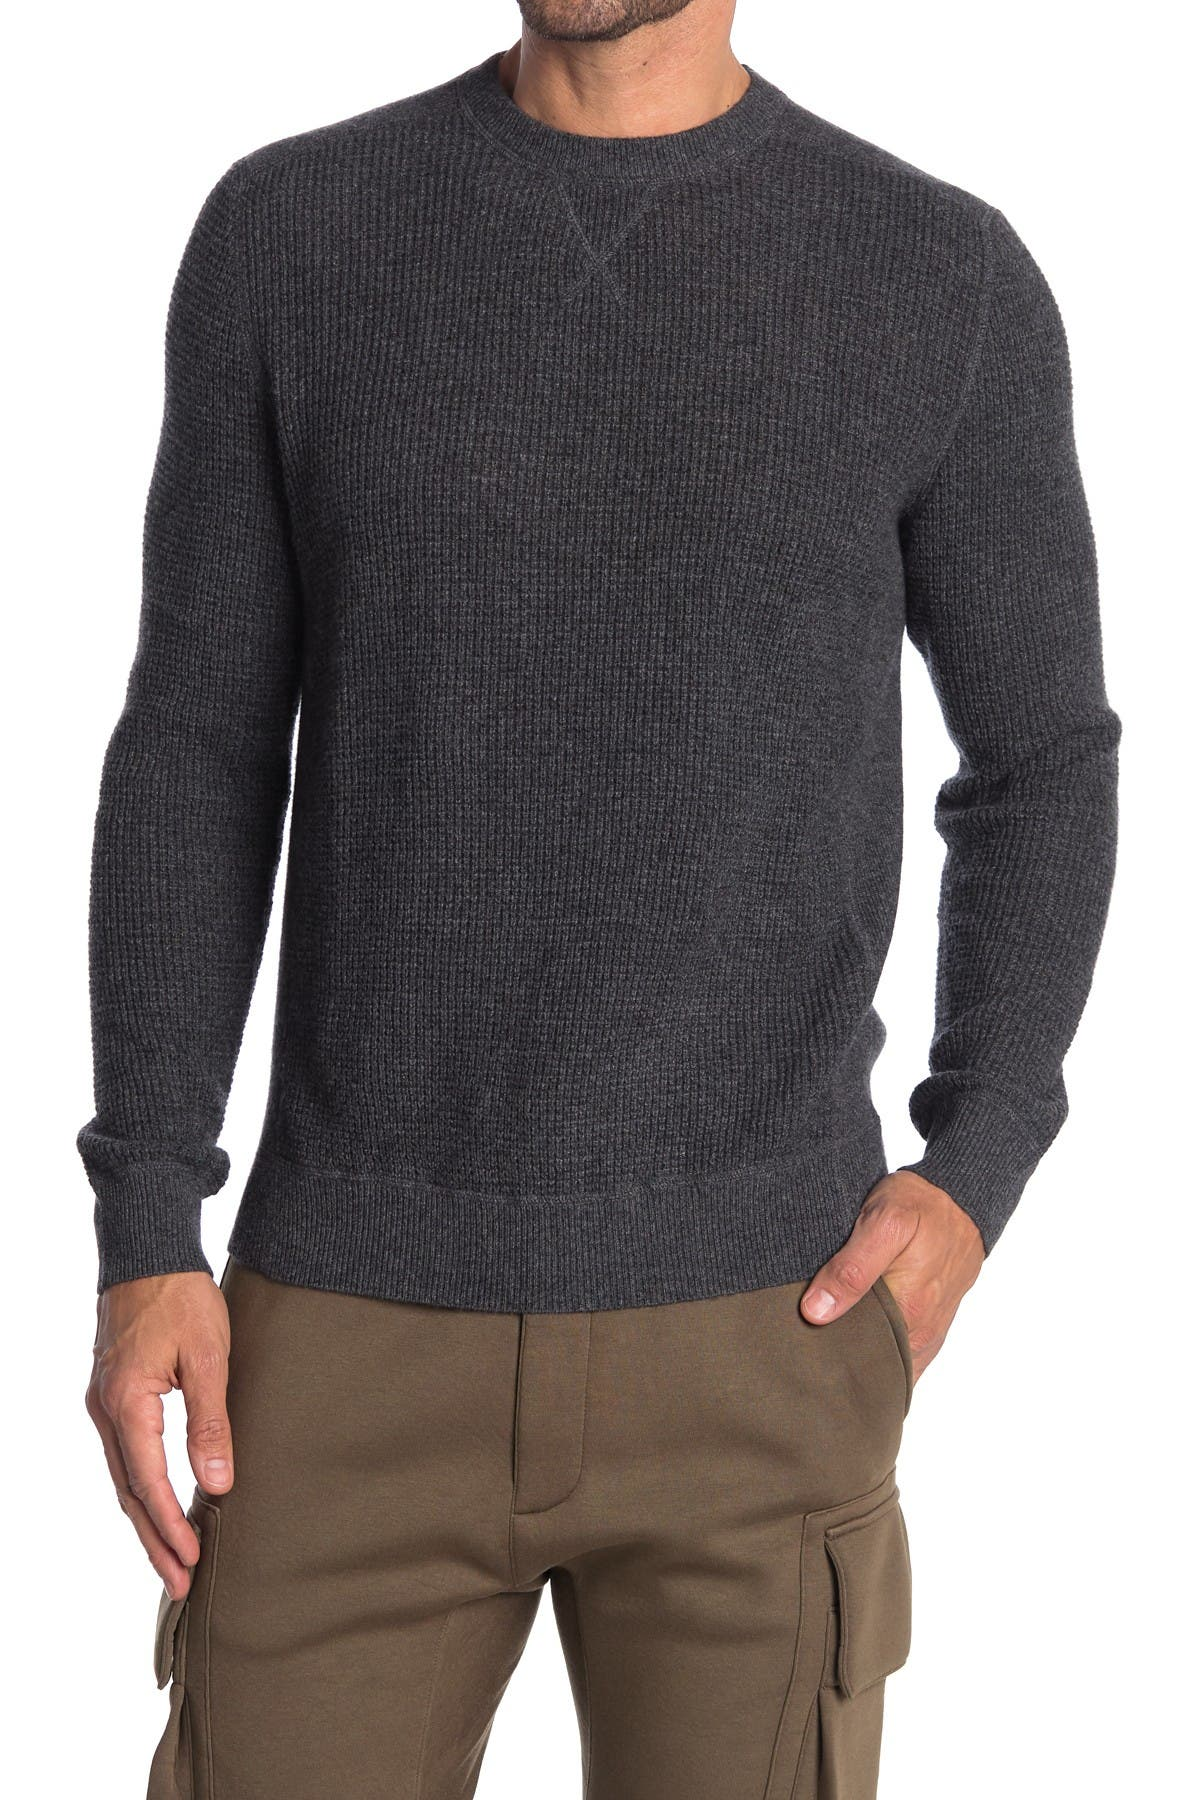 Image of Stewart of Scotland Cashmere Waffle Knit Crew Neck Sweater